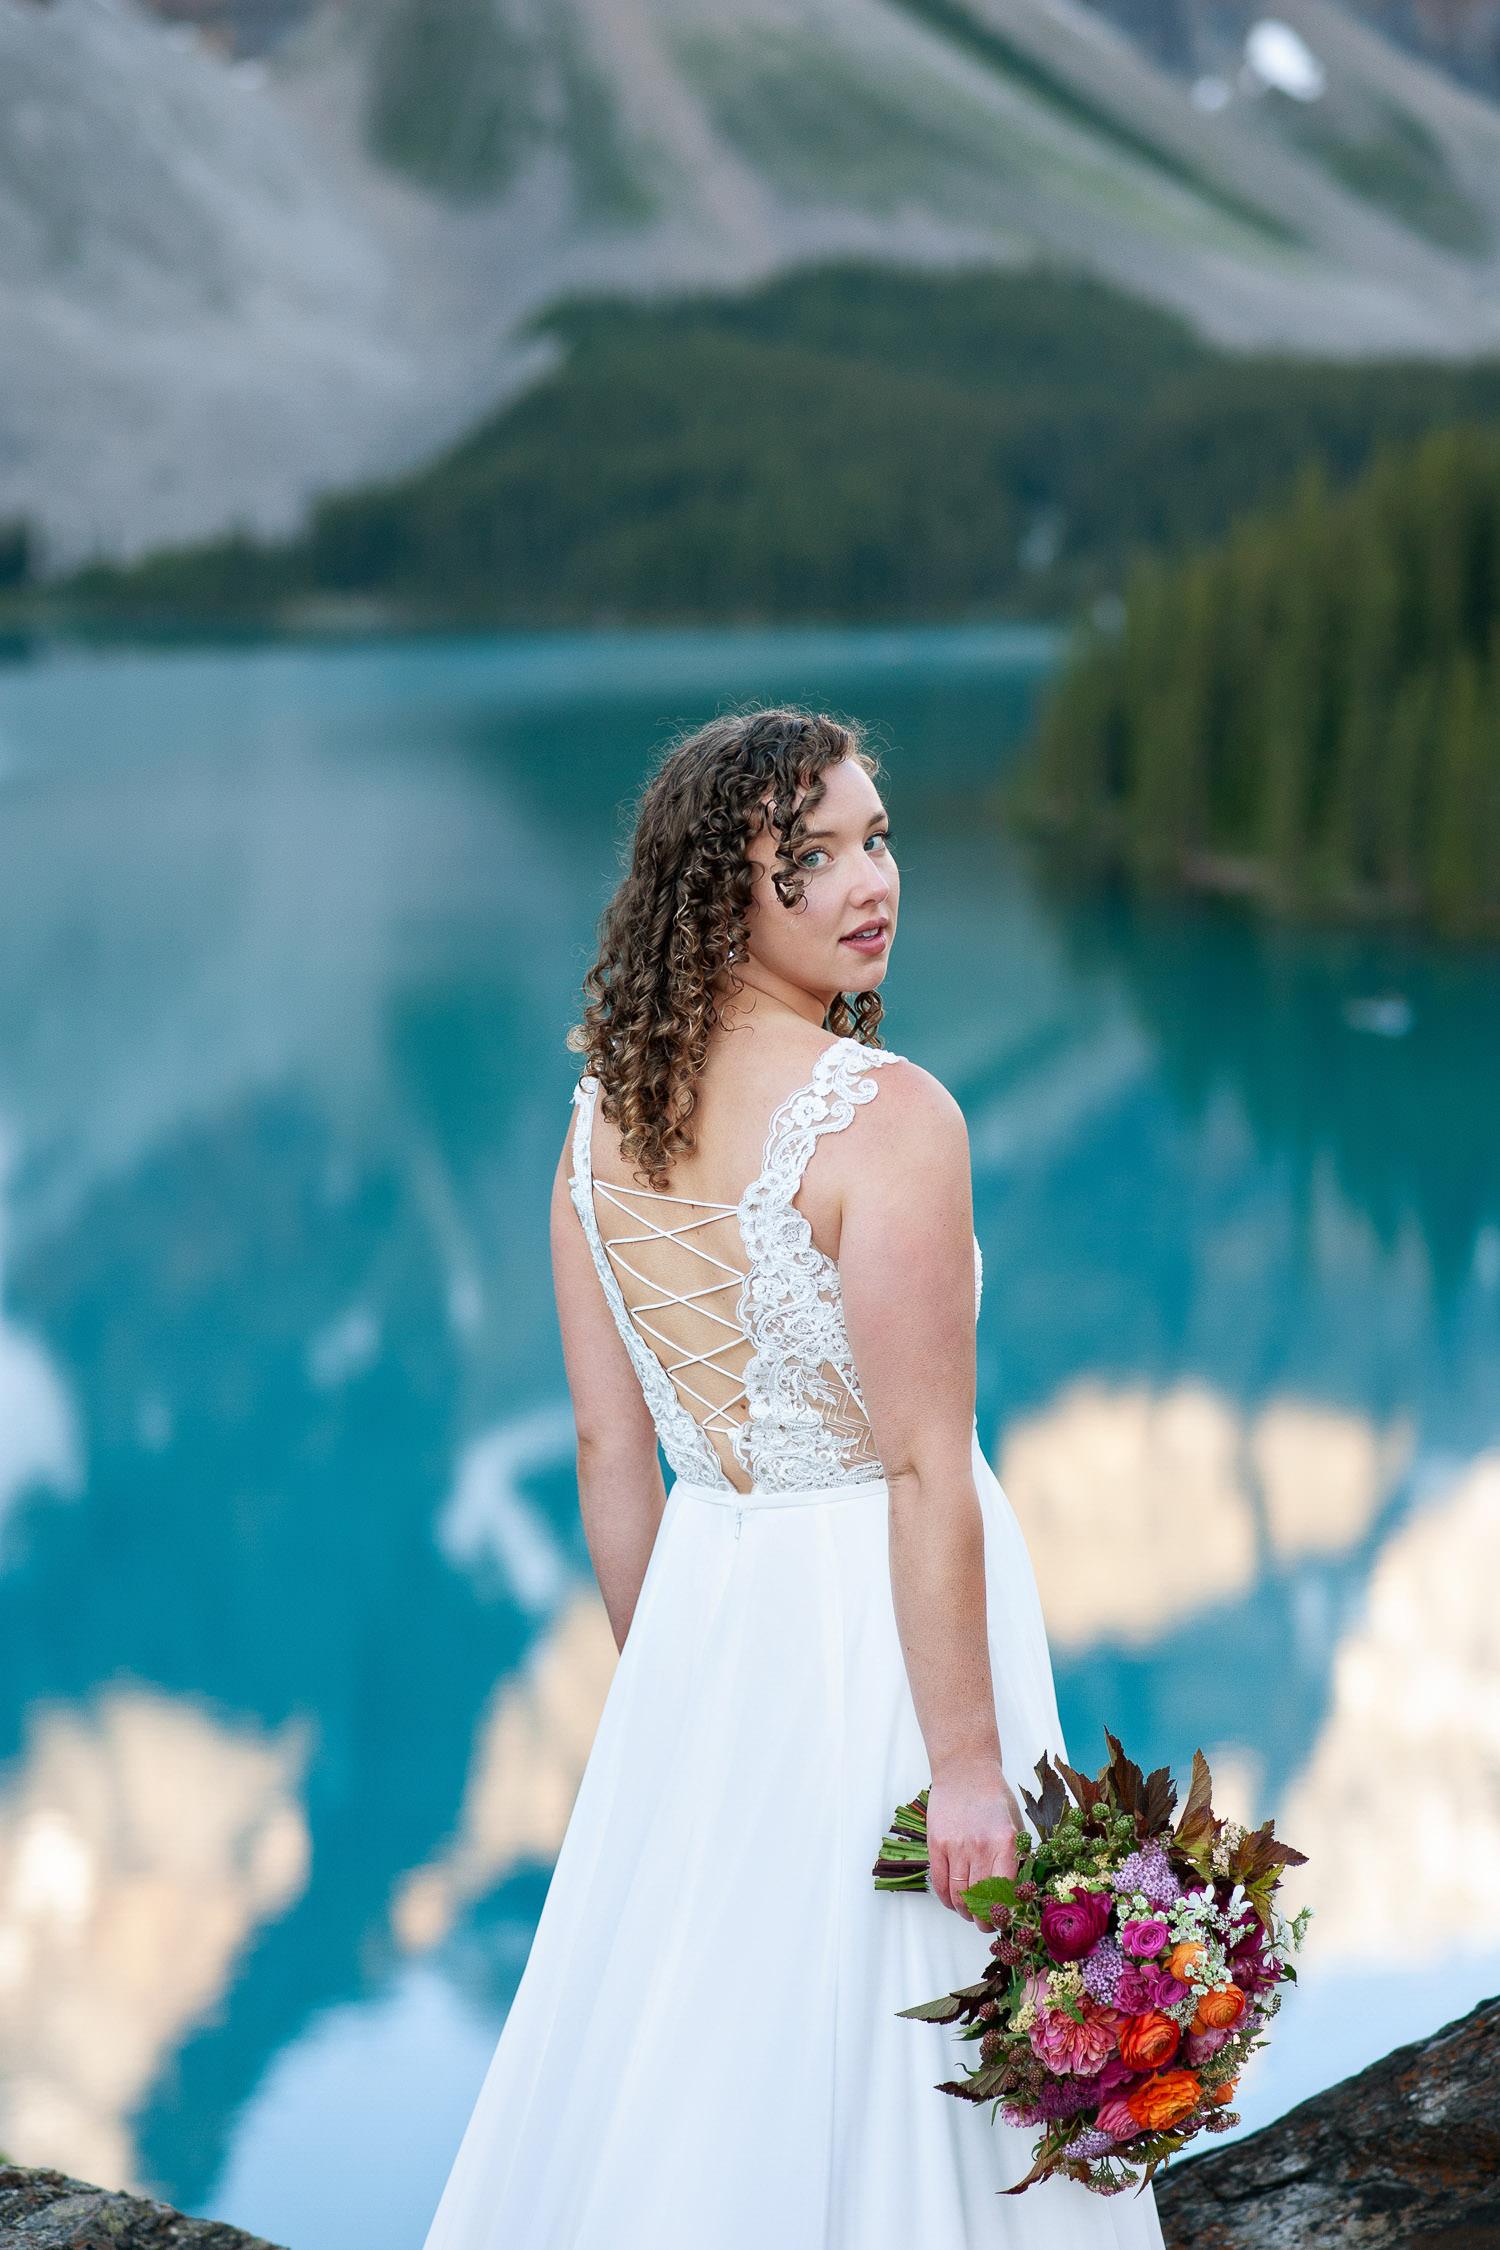 Beautiful bride during her Moraine Lake wedding photos captured by Tara Whittaker Photography